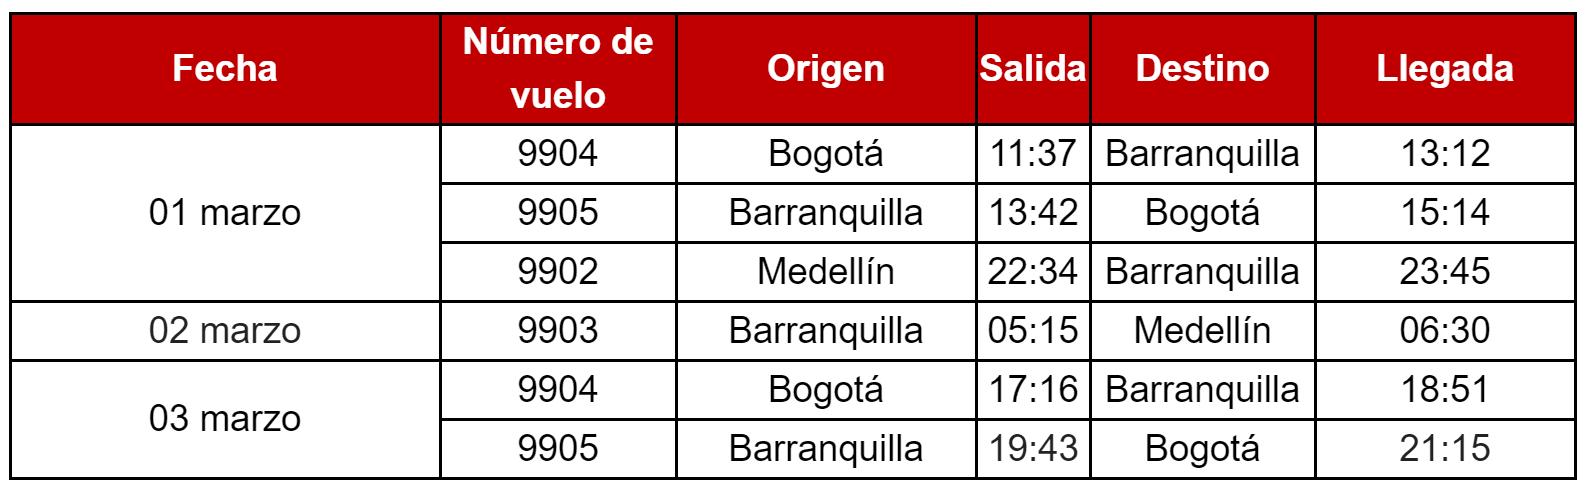 Itinerario de Avianca por Carnaval Barranquilla 2019.